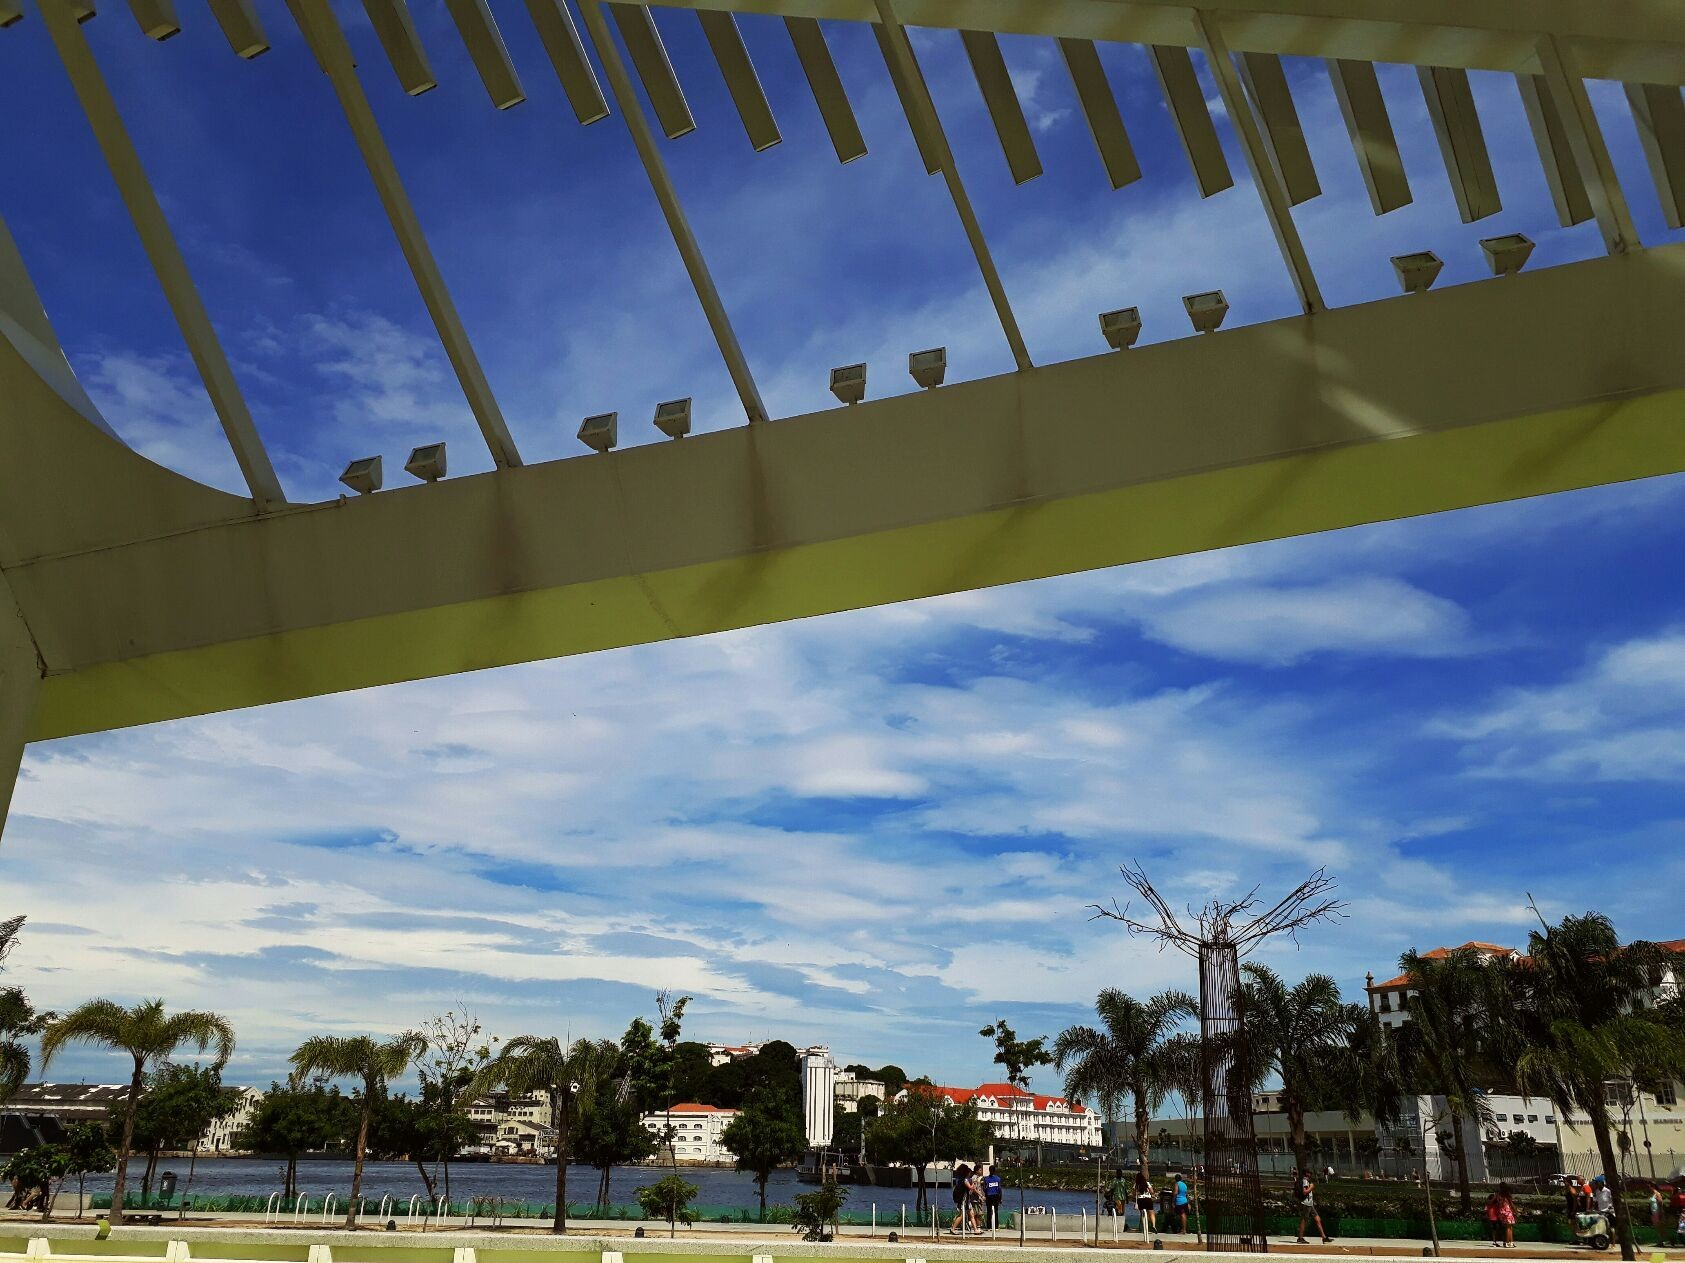 Foto: RJ #vejario #annerj #igmasters #fineartphotography #artenoolhar #cool #decorandocomclasse #decorlovers #designdeinteriores #californiaart #casacorsp #abstractart #photographylovers #youpic